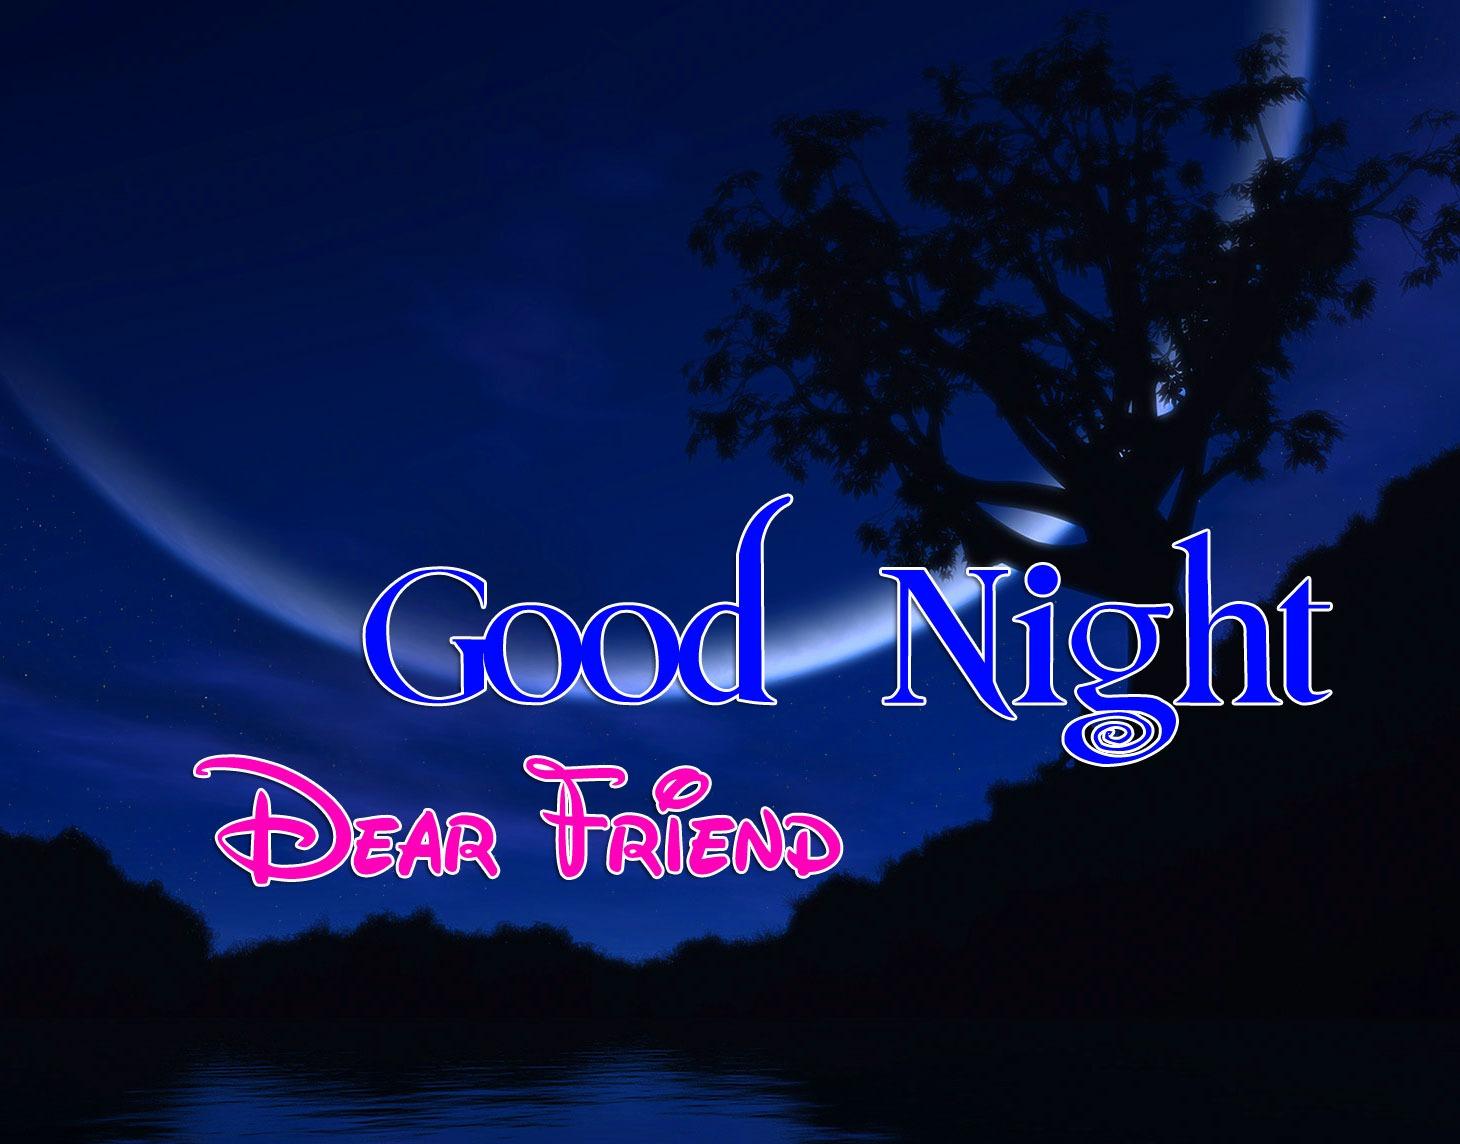 Free Good Night Images Wallpaper Download